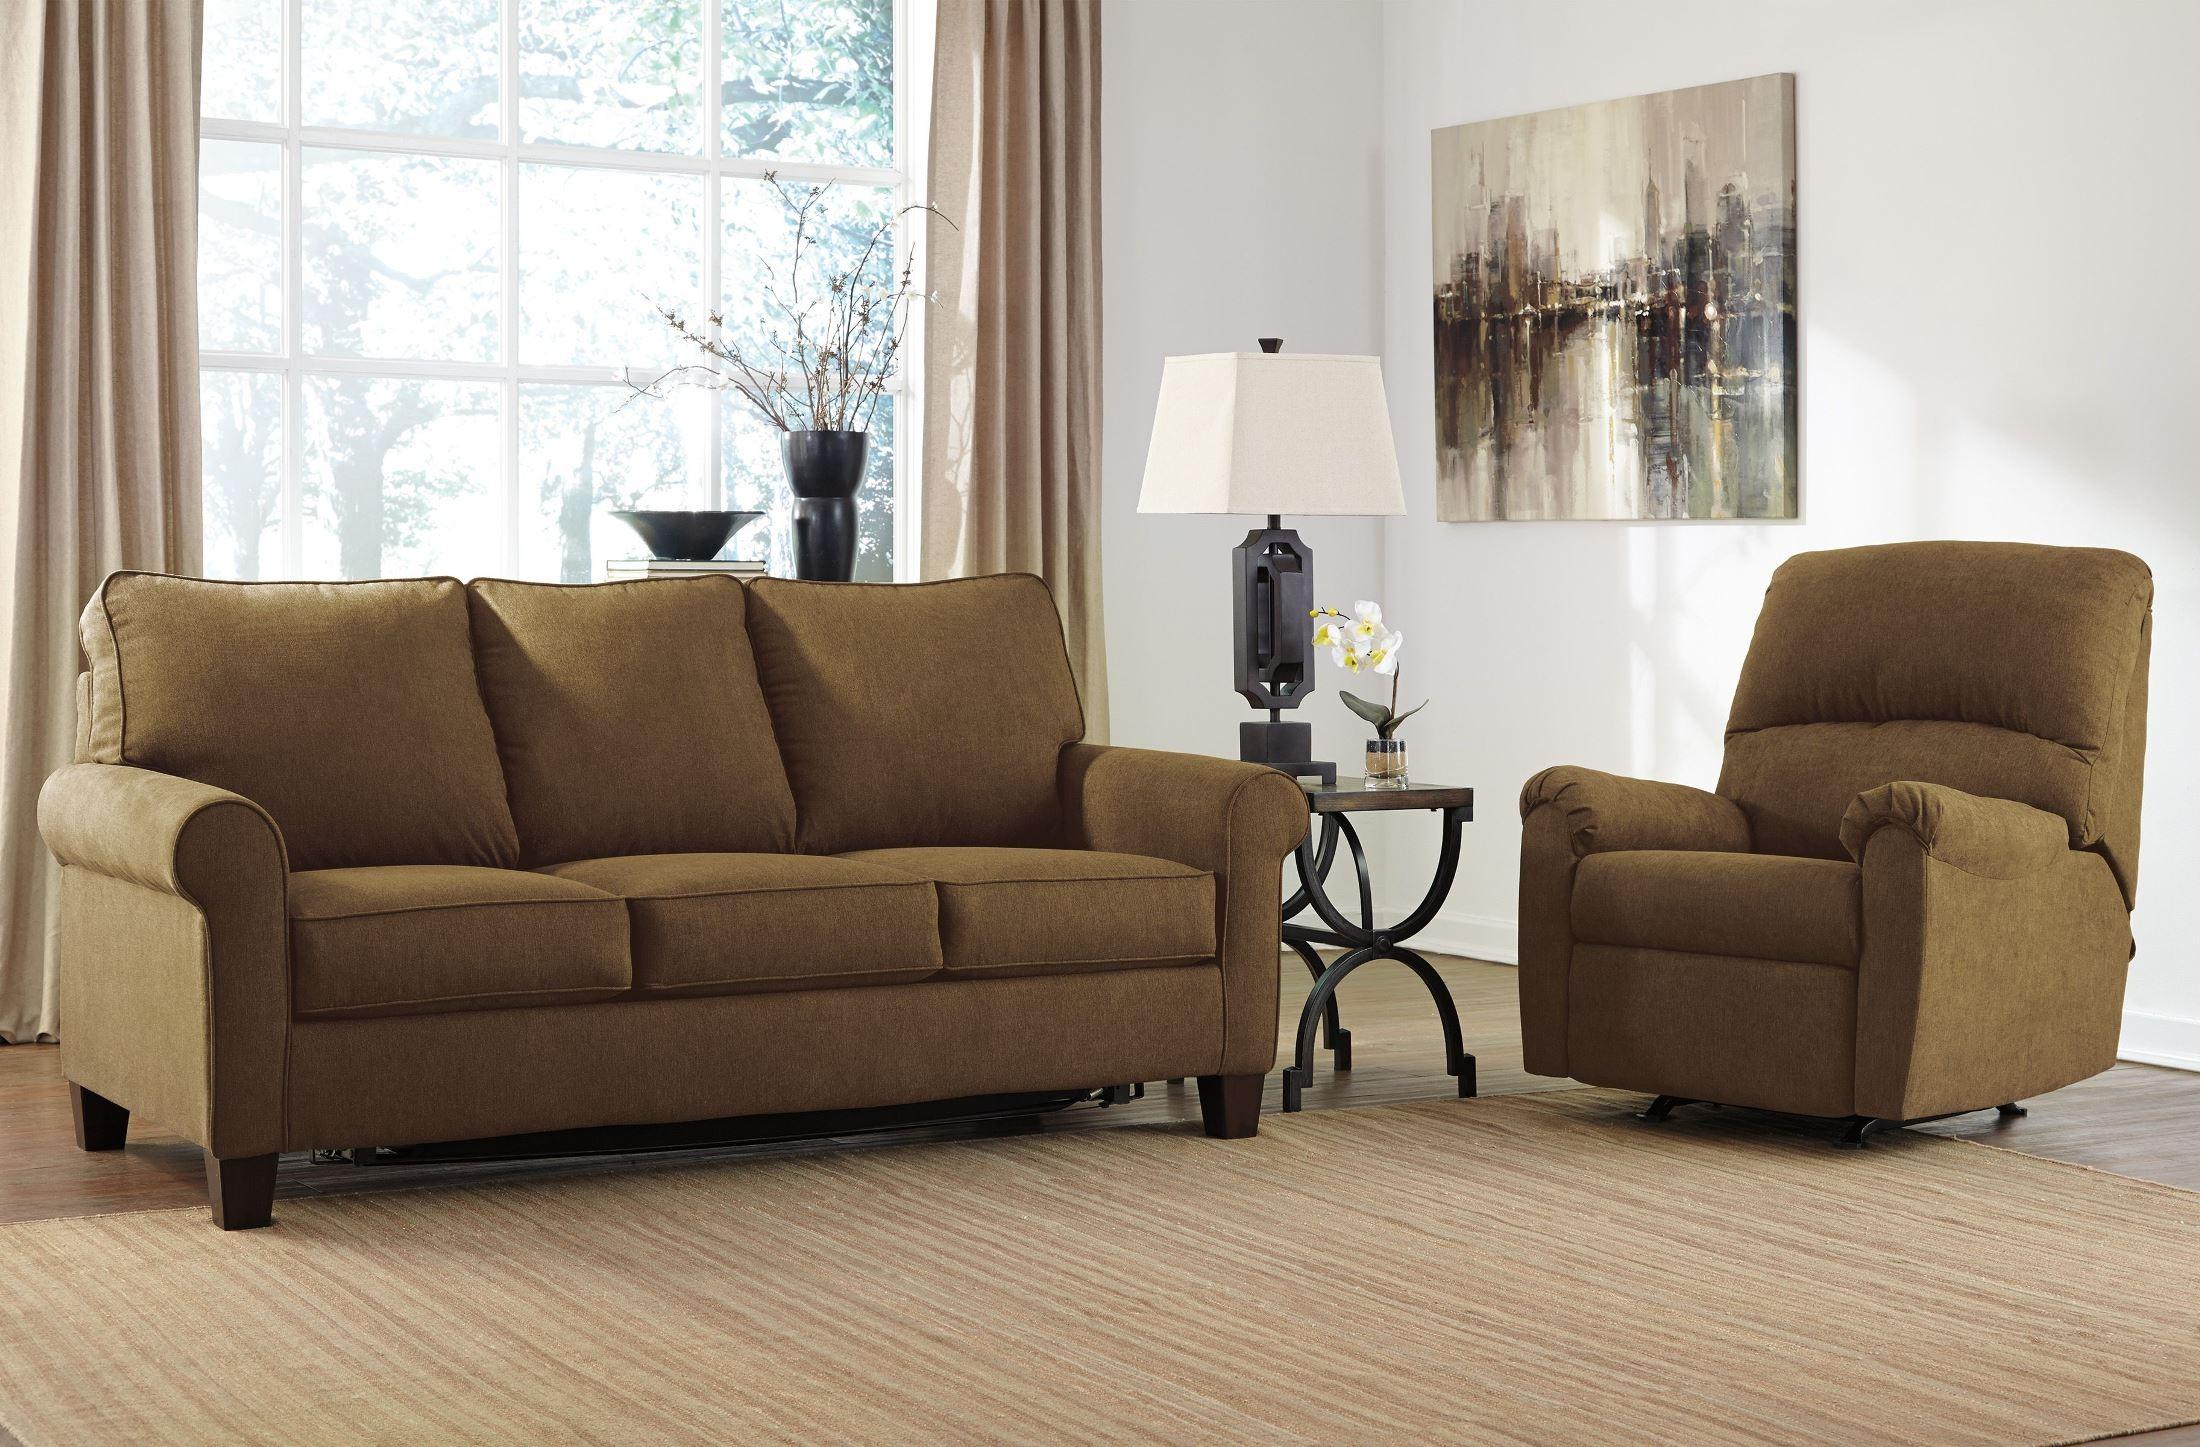 Zeth Basil Full Sofa Sleeper from Ashley 2710336  : 27103 36 251 from colemanfurniture.com size 2200 x 1447 jpeg 643kB